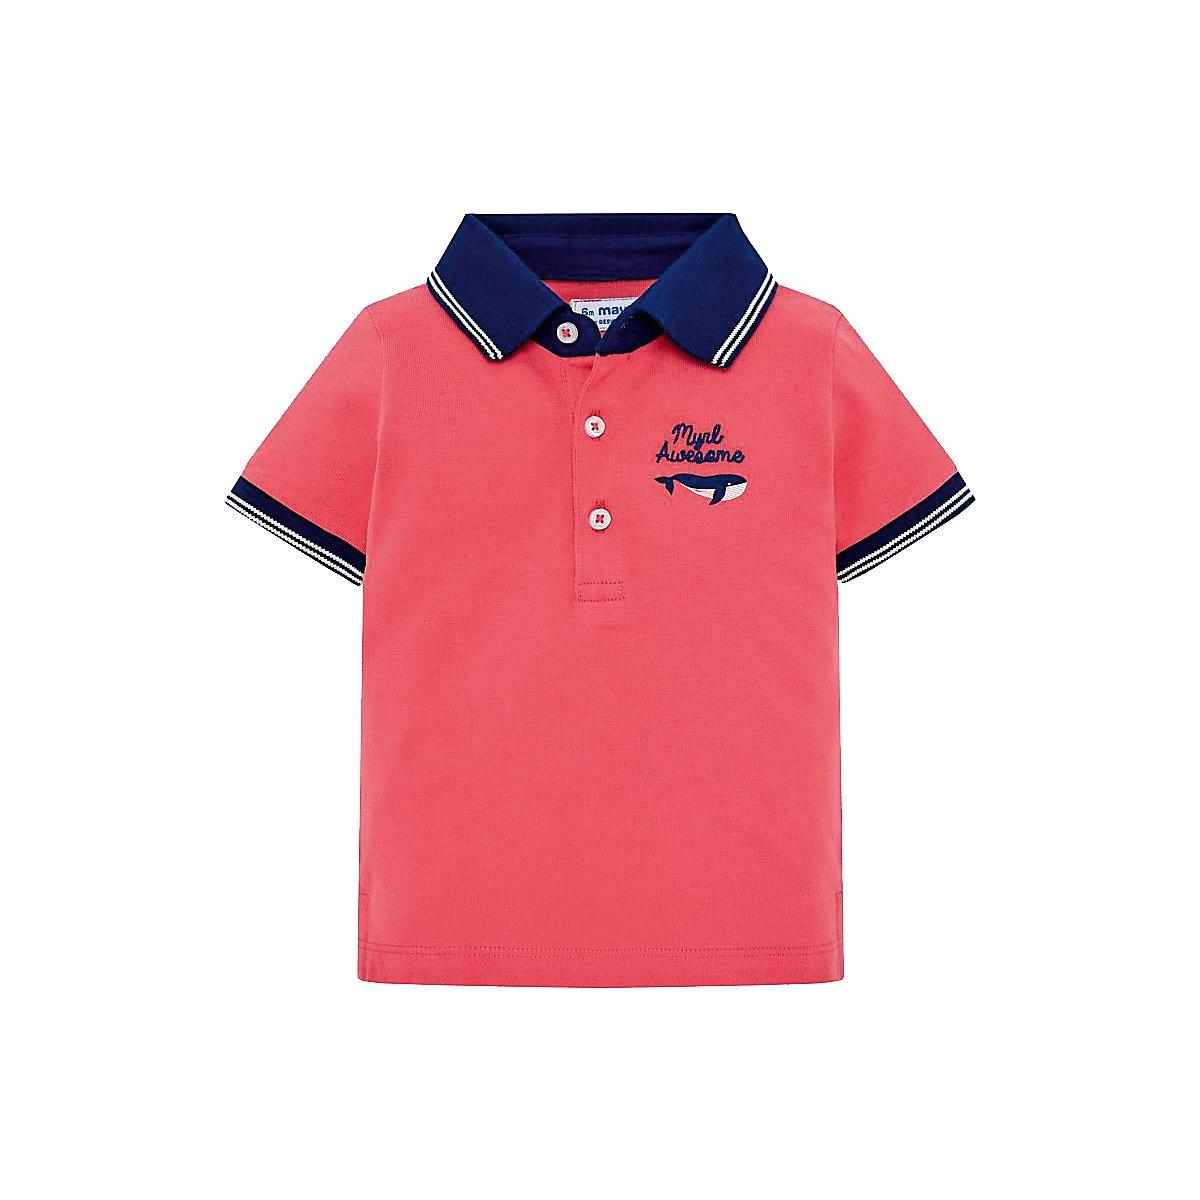 MAYORAL Polo Shirts 10688794 children clothing t-shirt shirt the print for boys